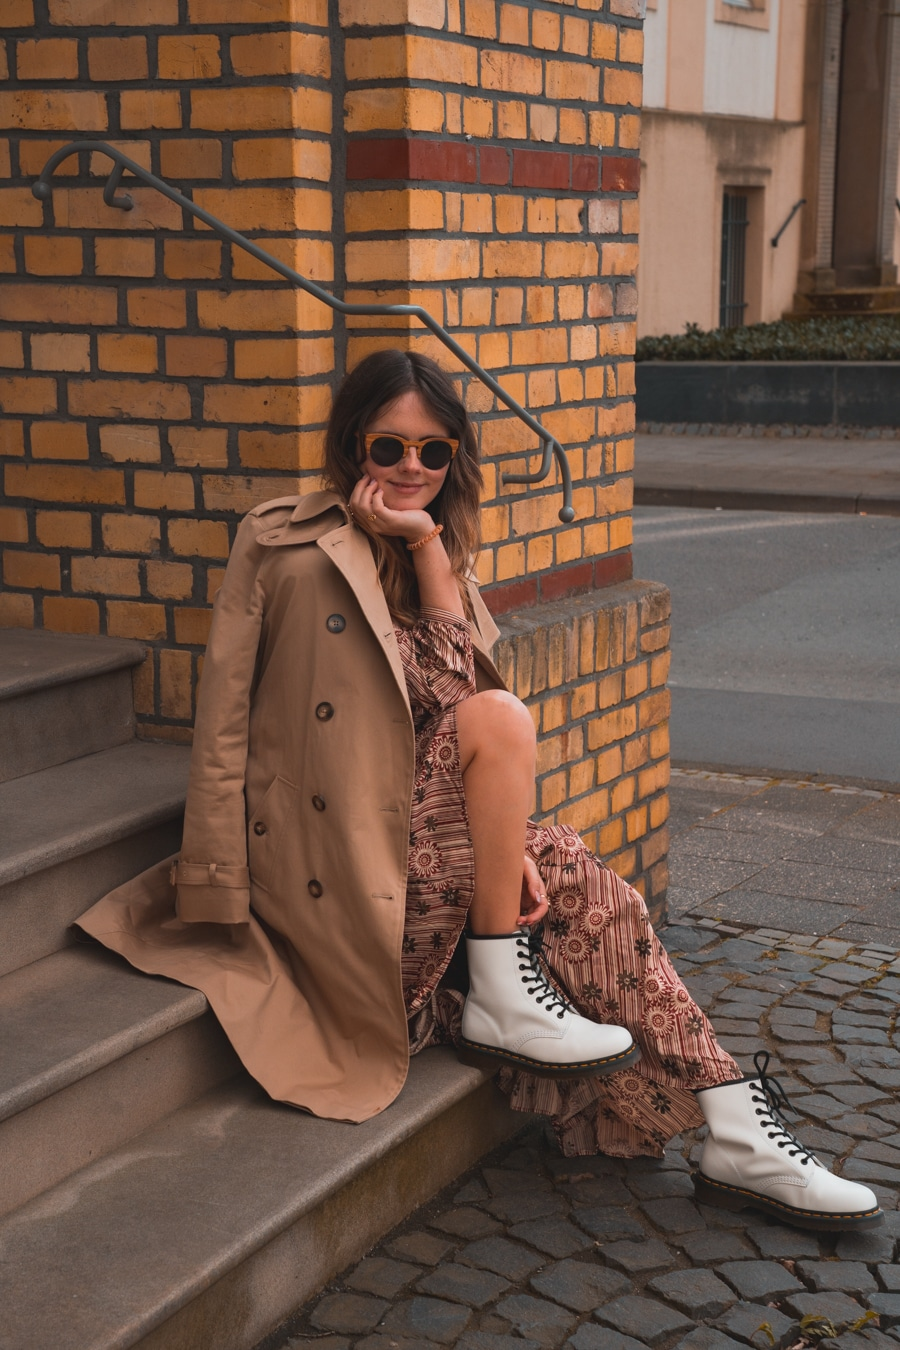 Outfit Inspo - Maxikleid mit weißen Dr. Martens Boots kombinieren